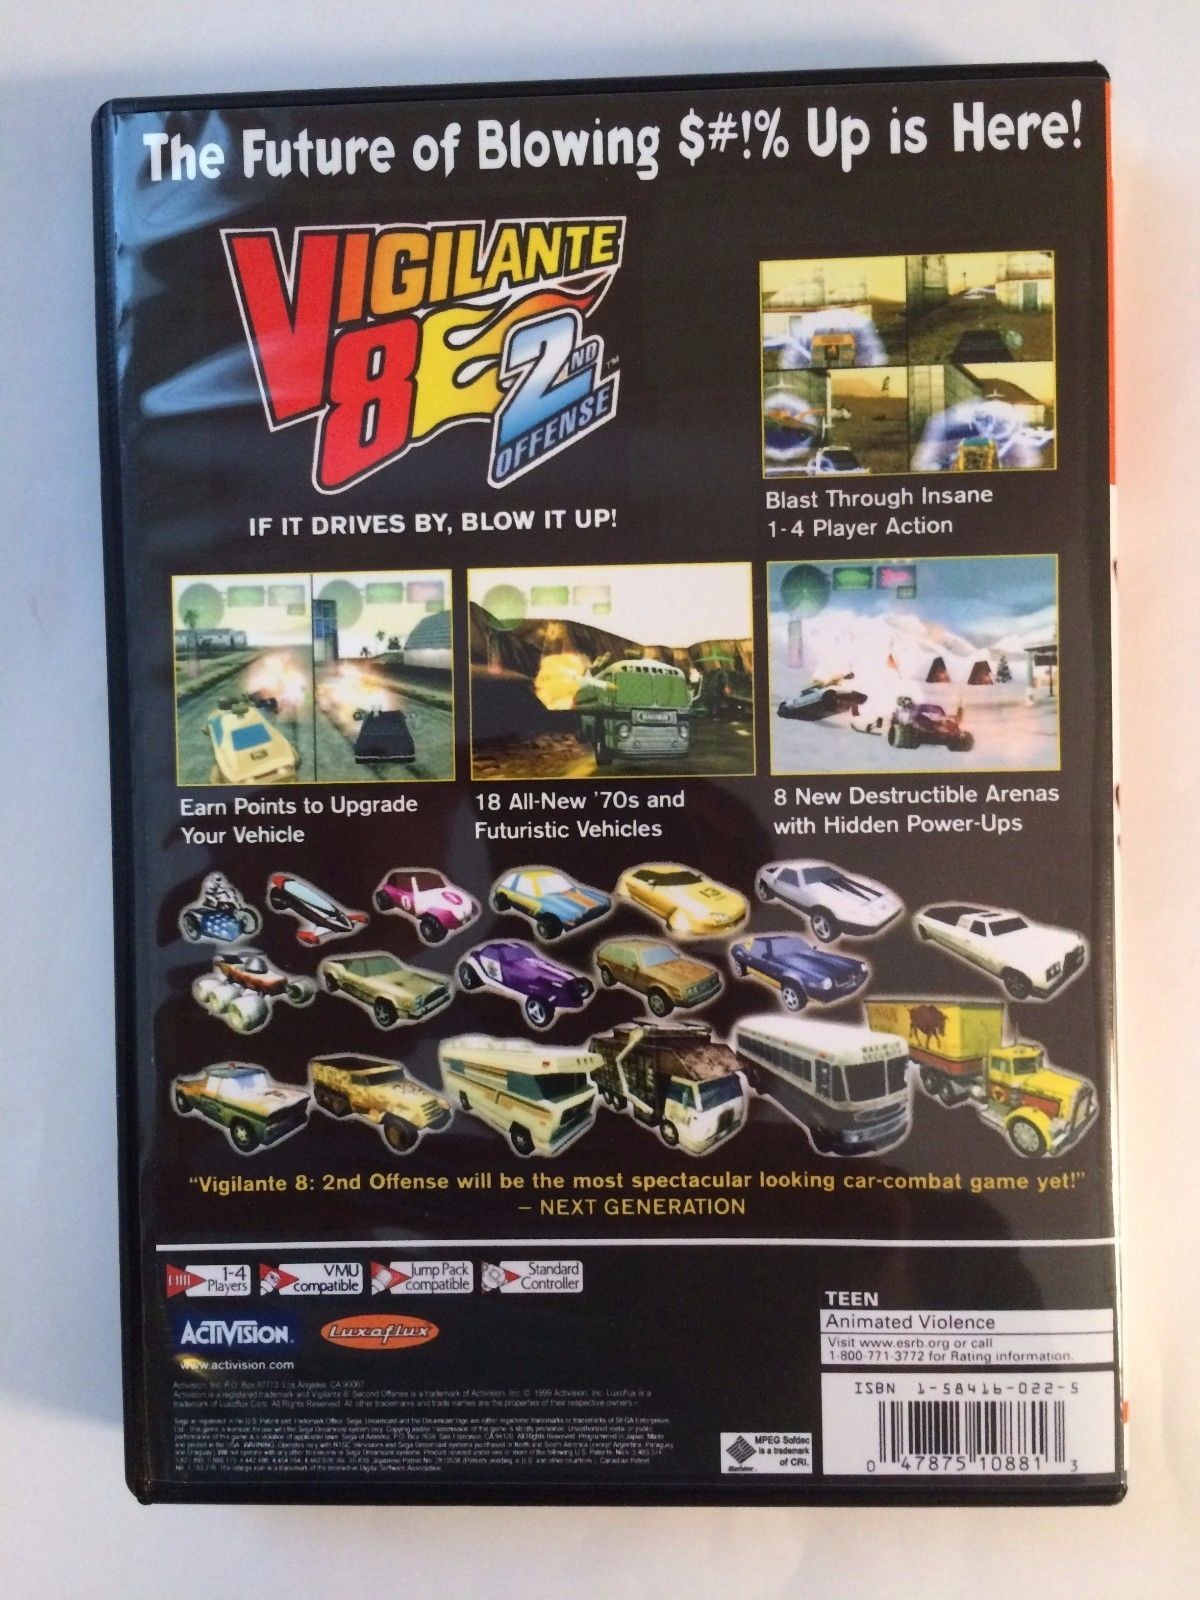 Vigilante 8 2nd Offense - Sega Dreamcast - Replacement Case - No Game